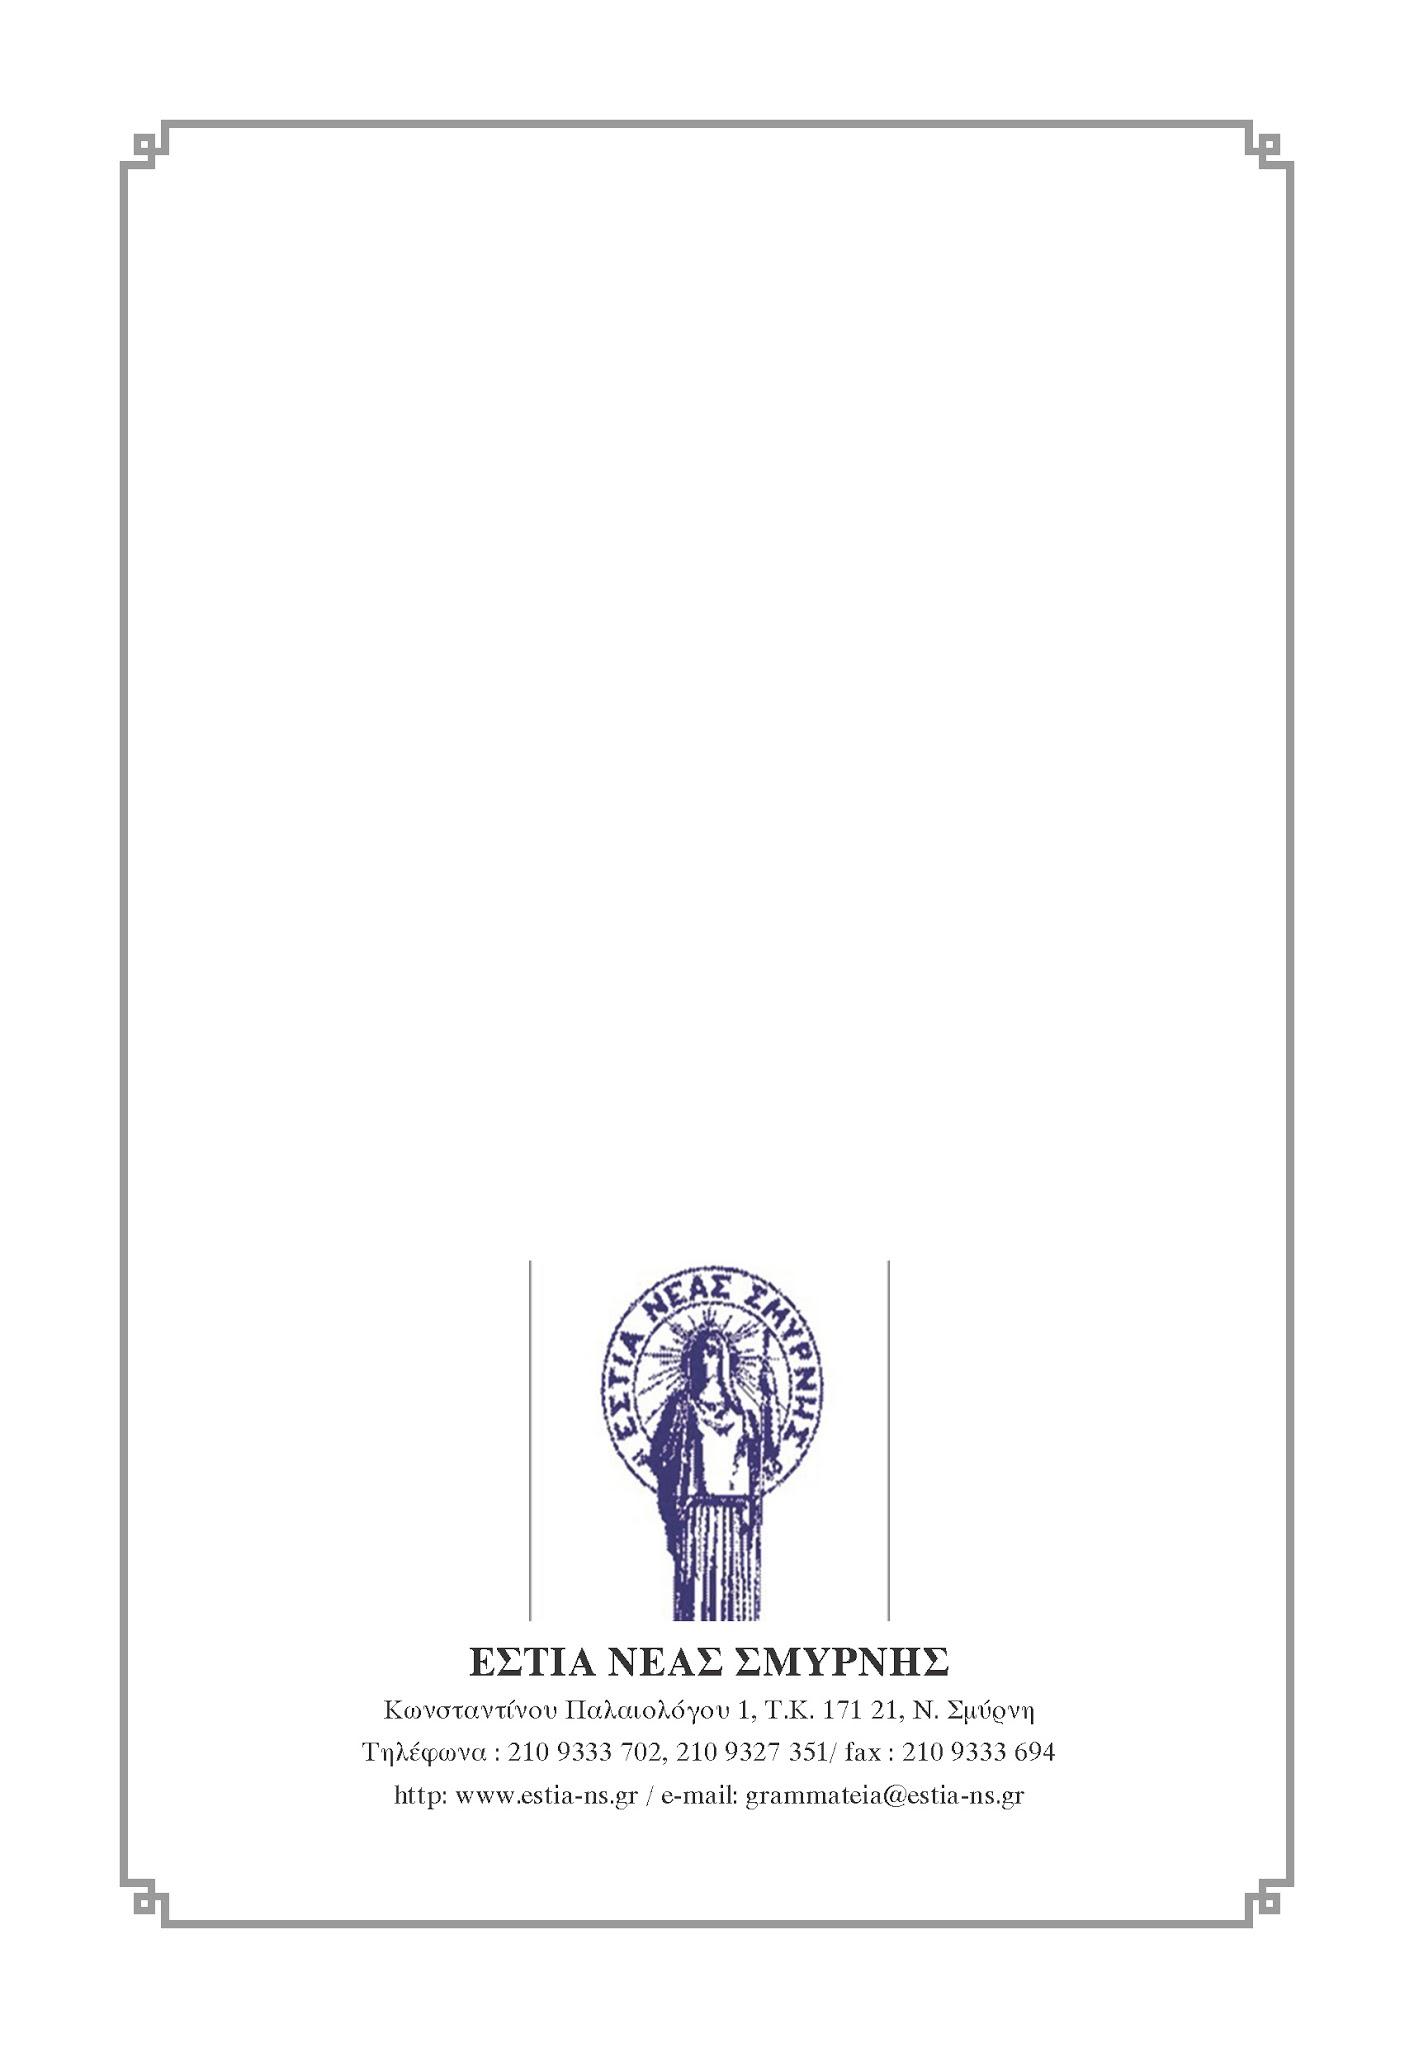 Photo: ΕΣΤΙΑ ΝΕΑΣ ΣΜΥΡΝΗΣ: «Το θαύμα της Πίστης στις Αθάνατες αξίες, στον Εθελοντισμό και στη Συλλογικότητα», της Βιργινίας Χαμουδοπούλου-Κωνσταντινίδου, Γενικής Γραμματέως της Εστίας, Δεκέμβριος 2015, σελ. 8.